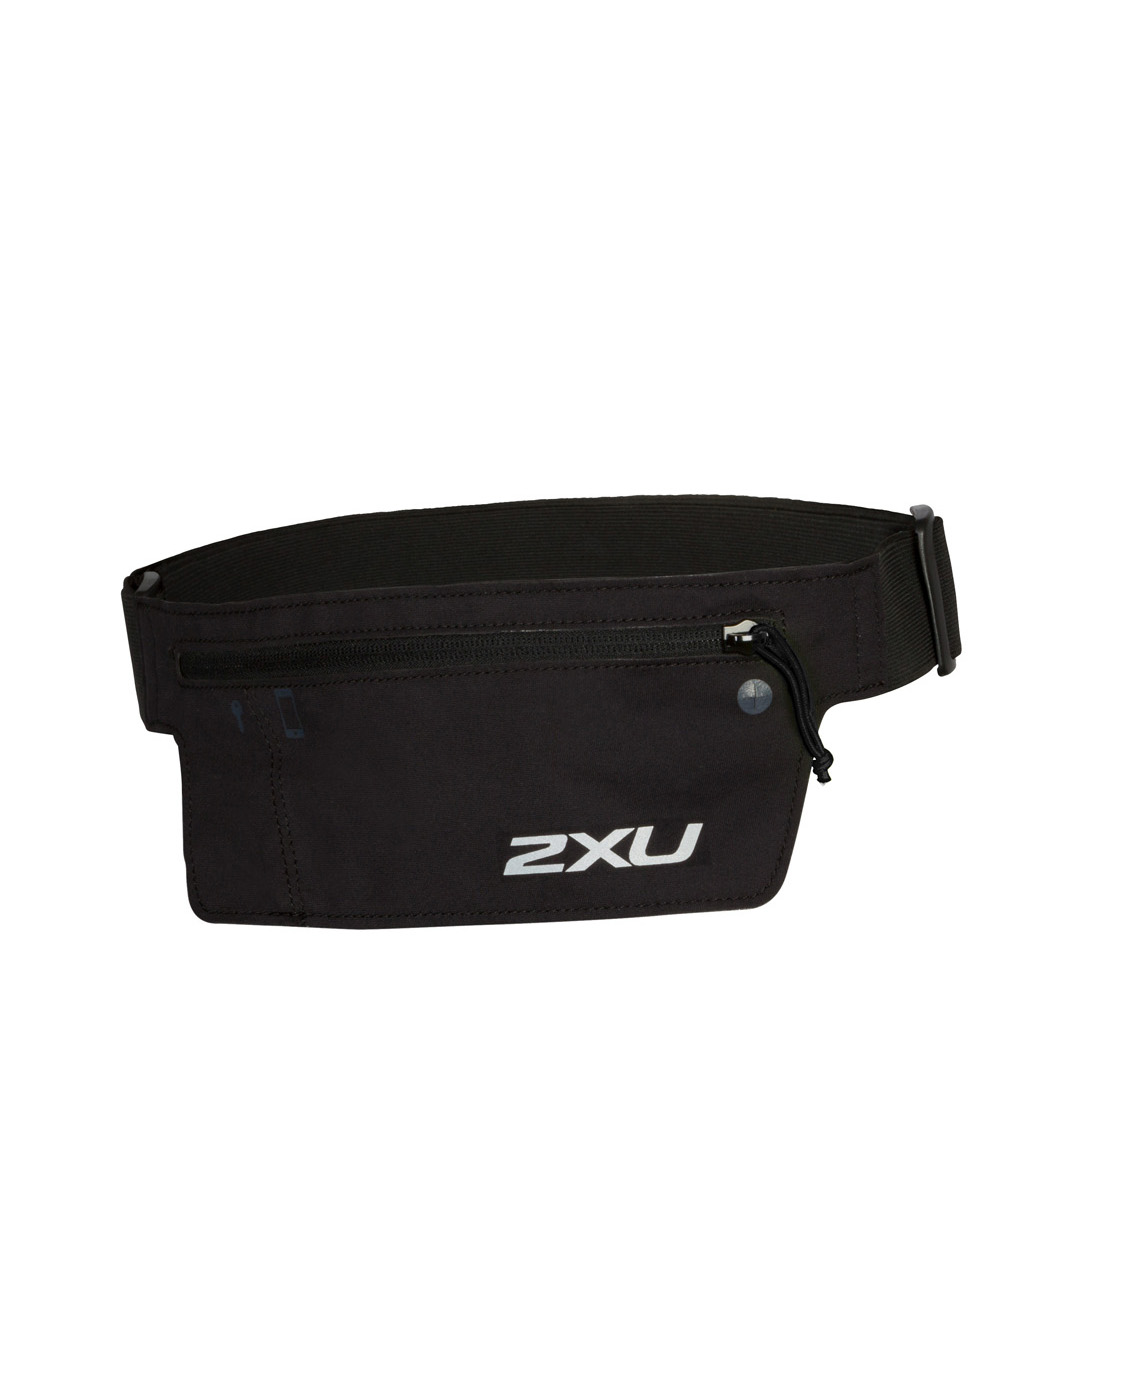 2XU Unisex Run Belt - Black/Black